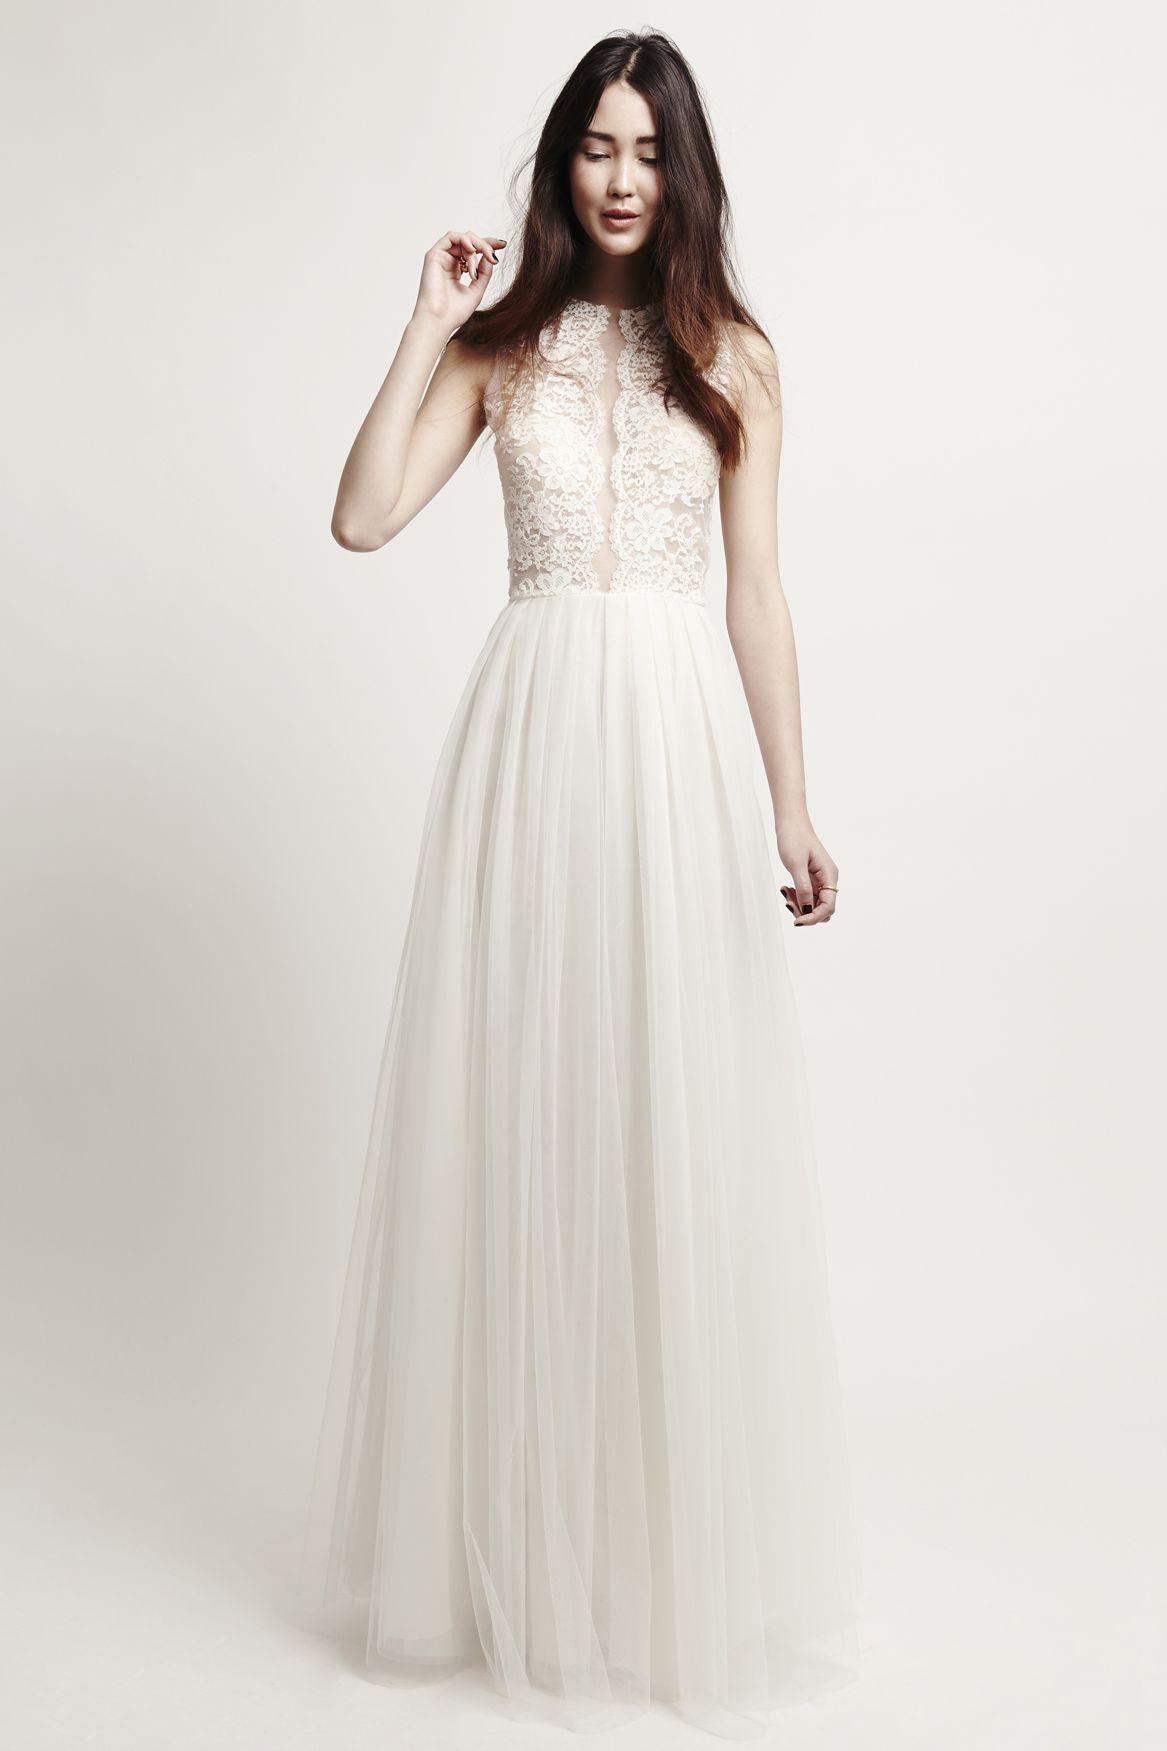 petite fleur dress kaviar gauche bridal dresses bridal gowns designer berlin wedding gown. Black Bedroom Furniture Sets. Home Design Ideas